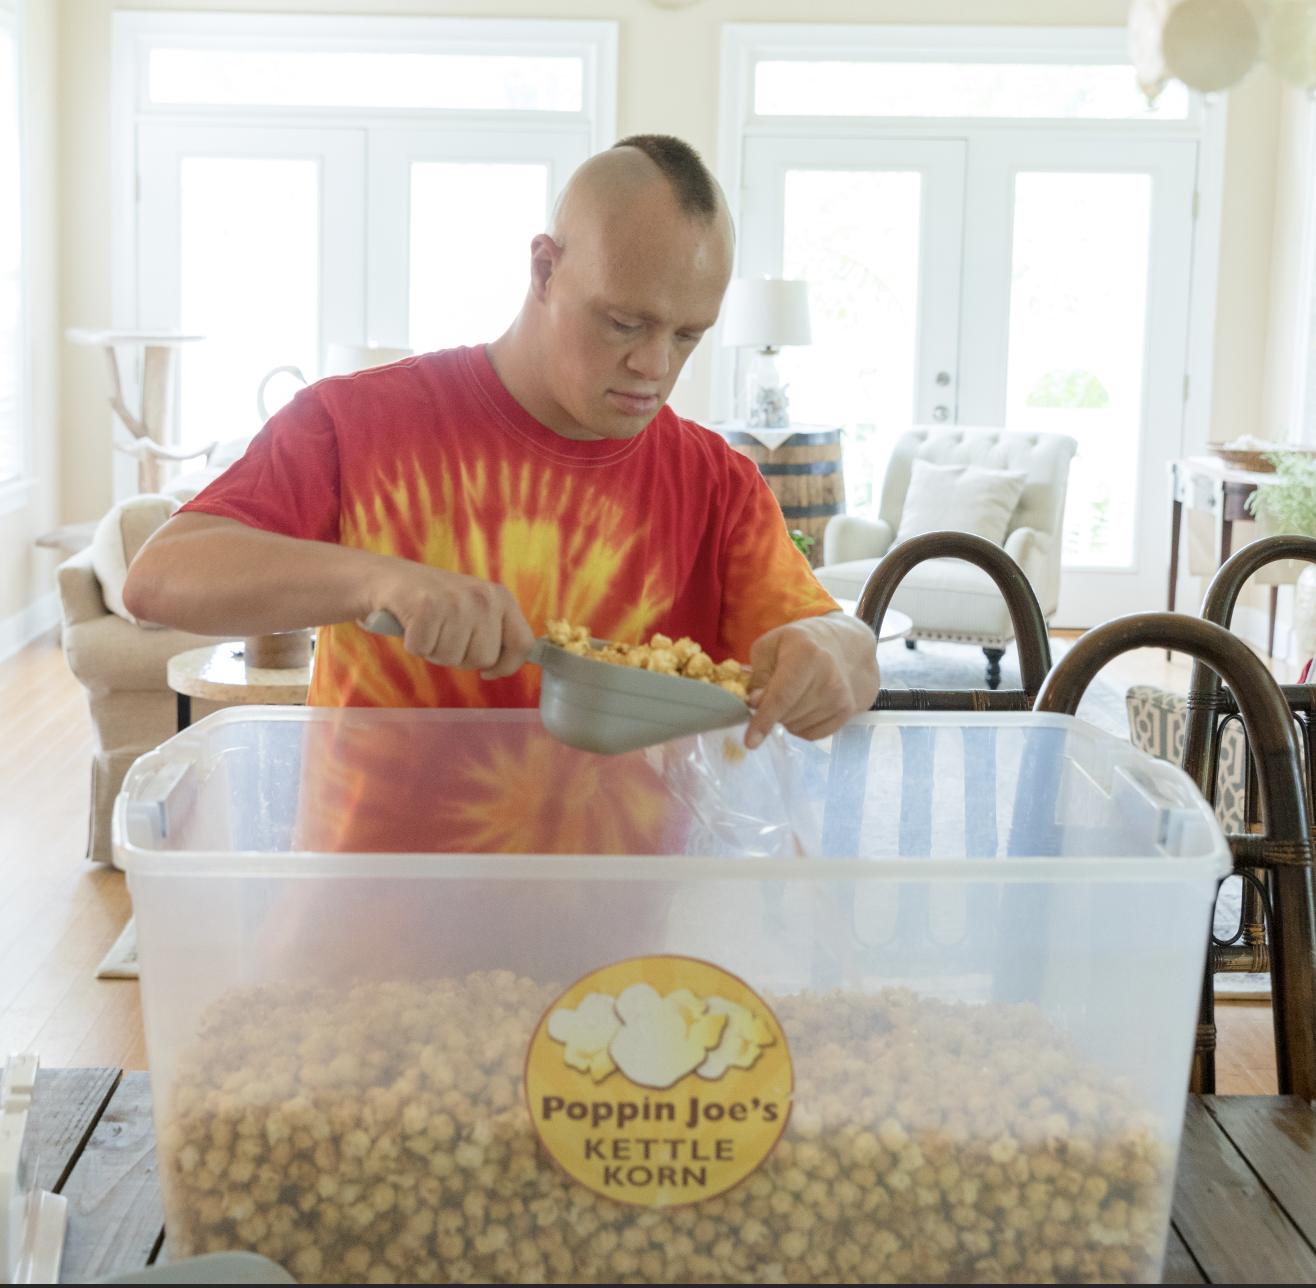 Joe Steffy working in his popcorn business